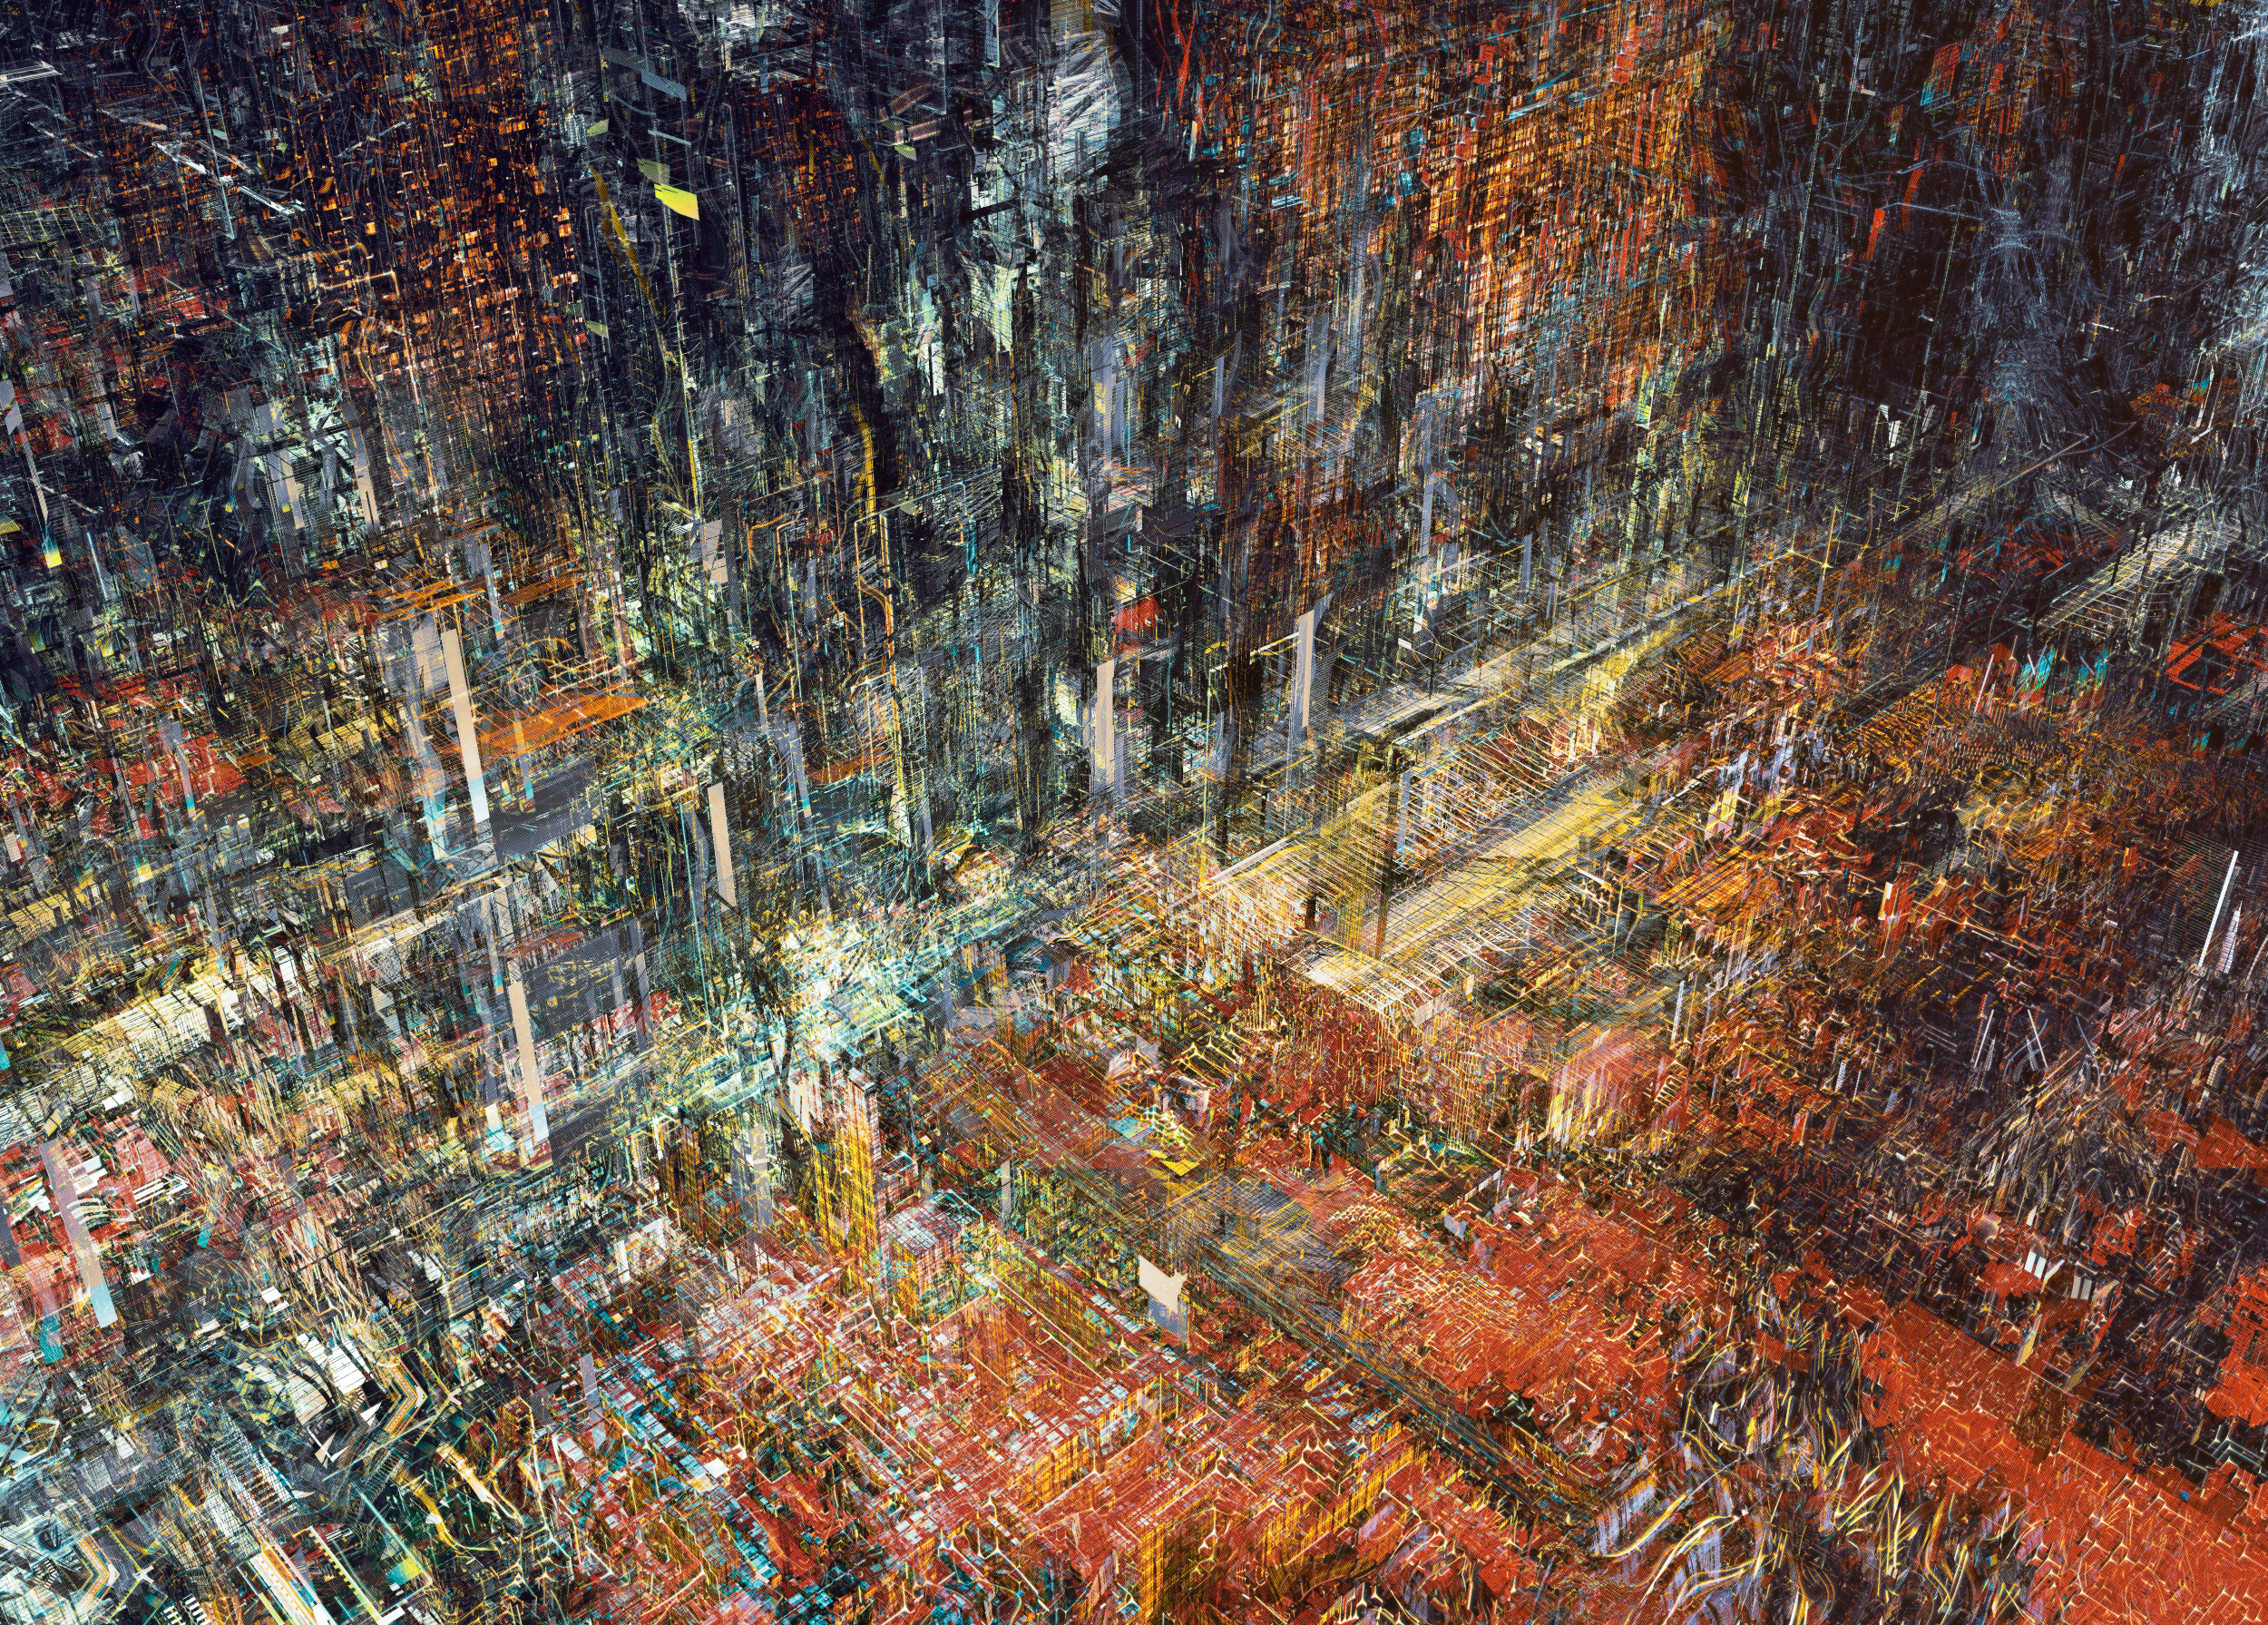 WASTELAND/illustration series (c) atelier olschinsky / Peter Olschinsky, 2013.